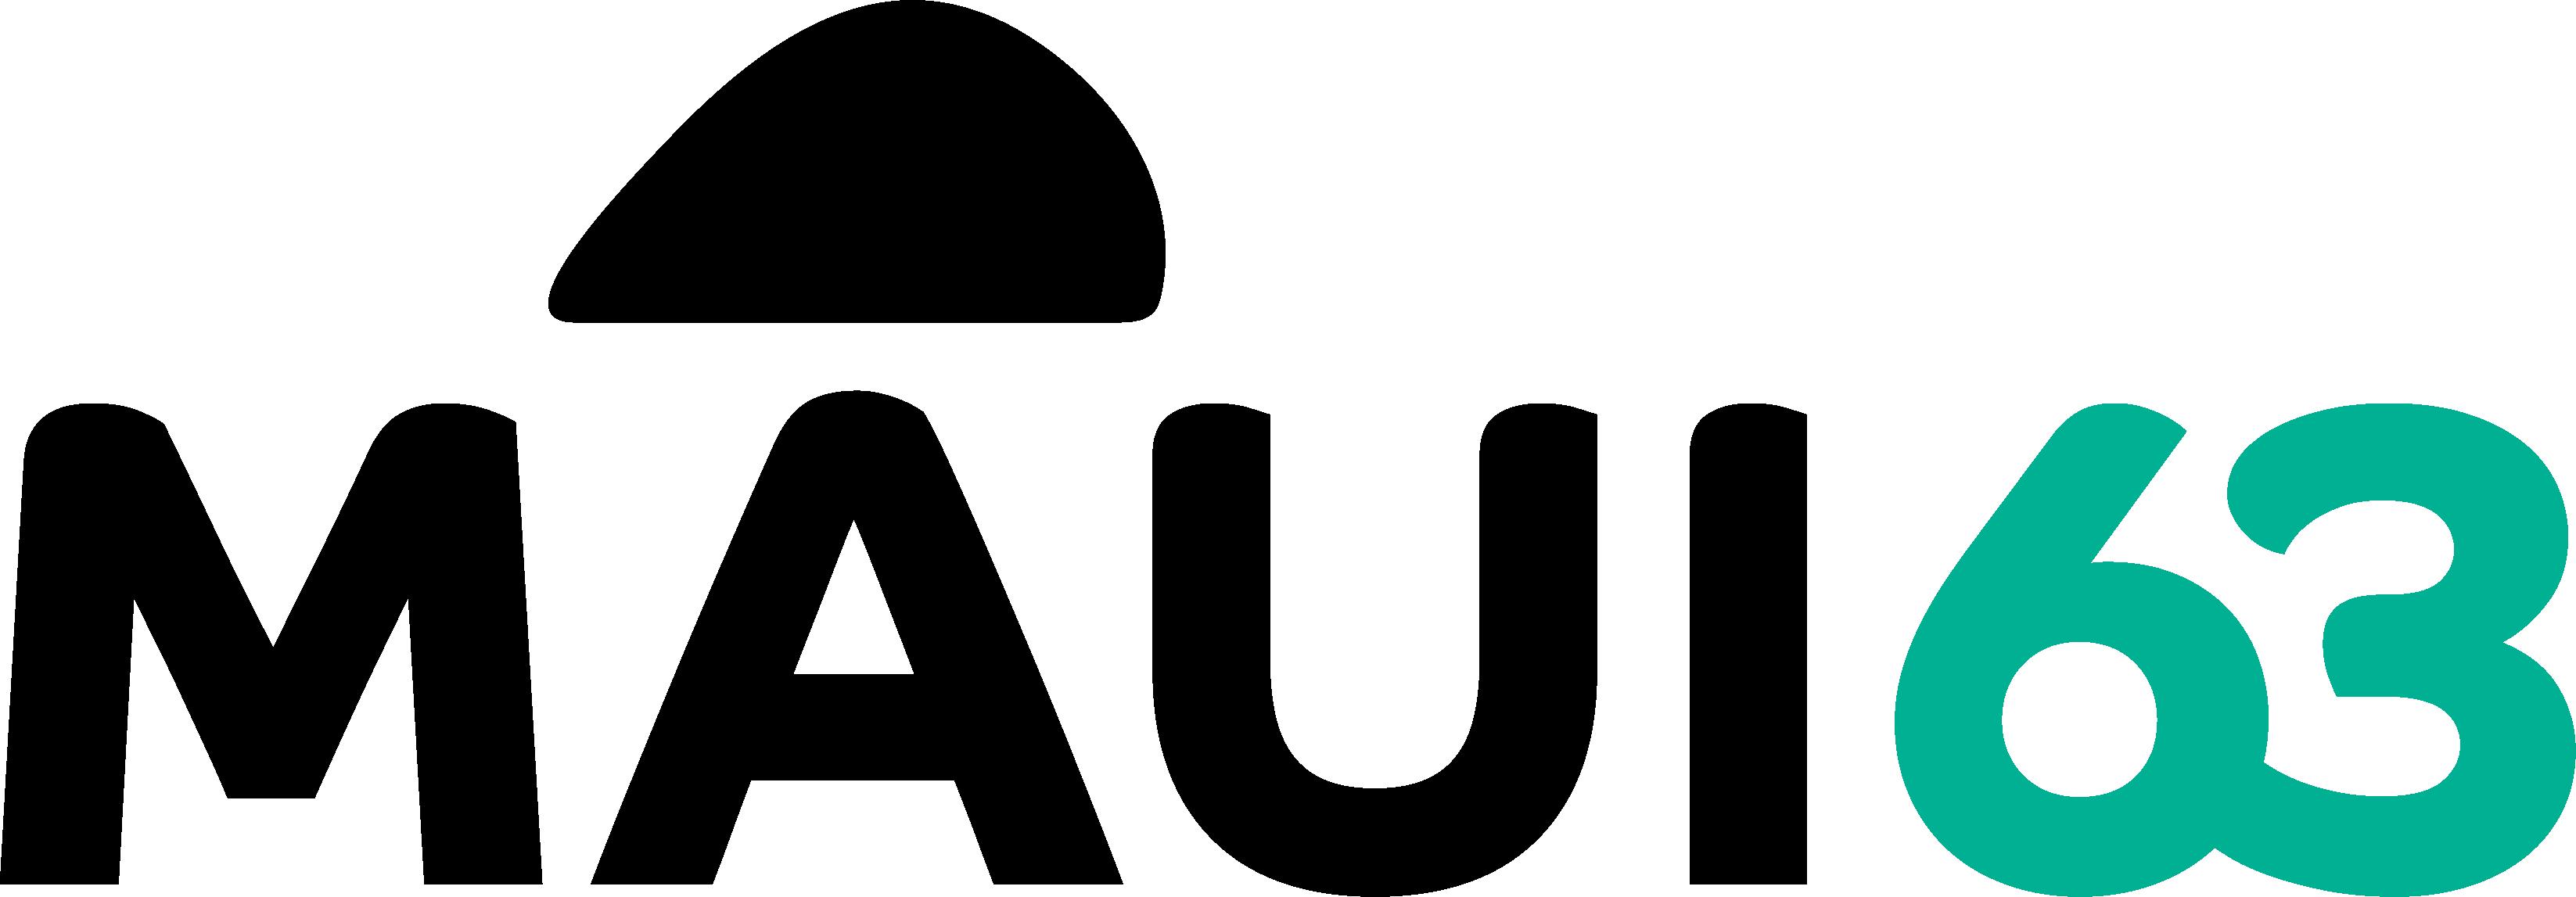 Maui63 logo